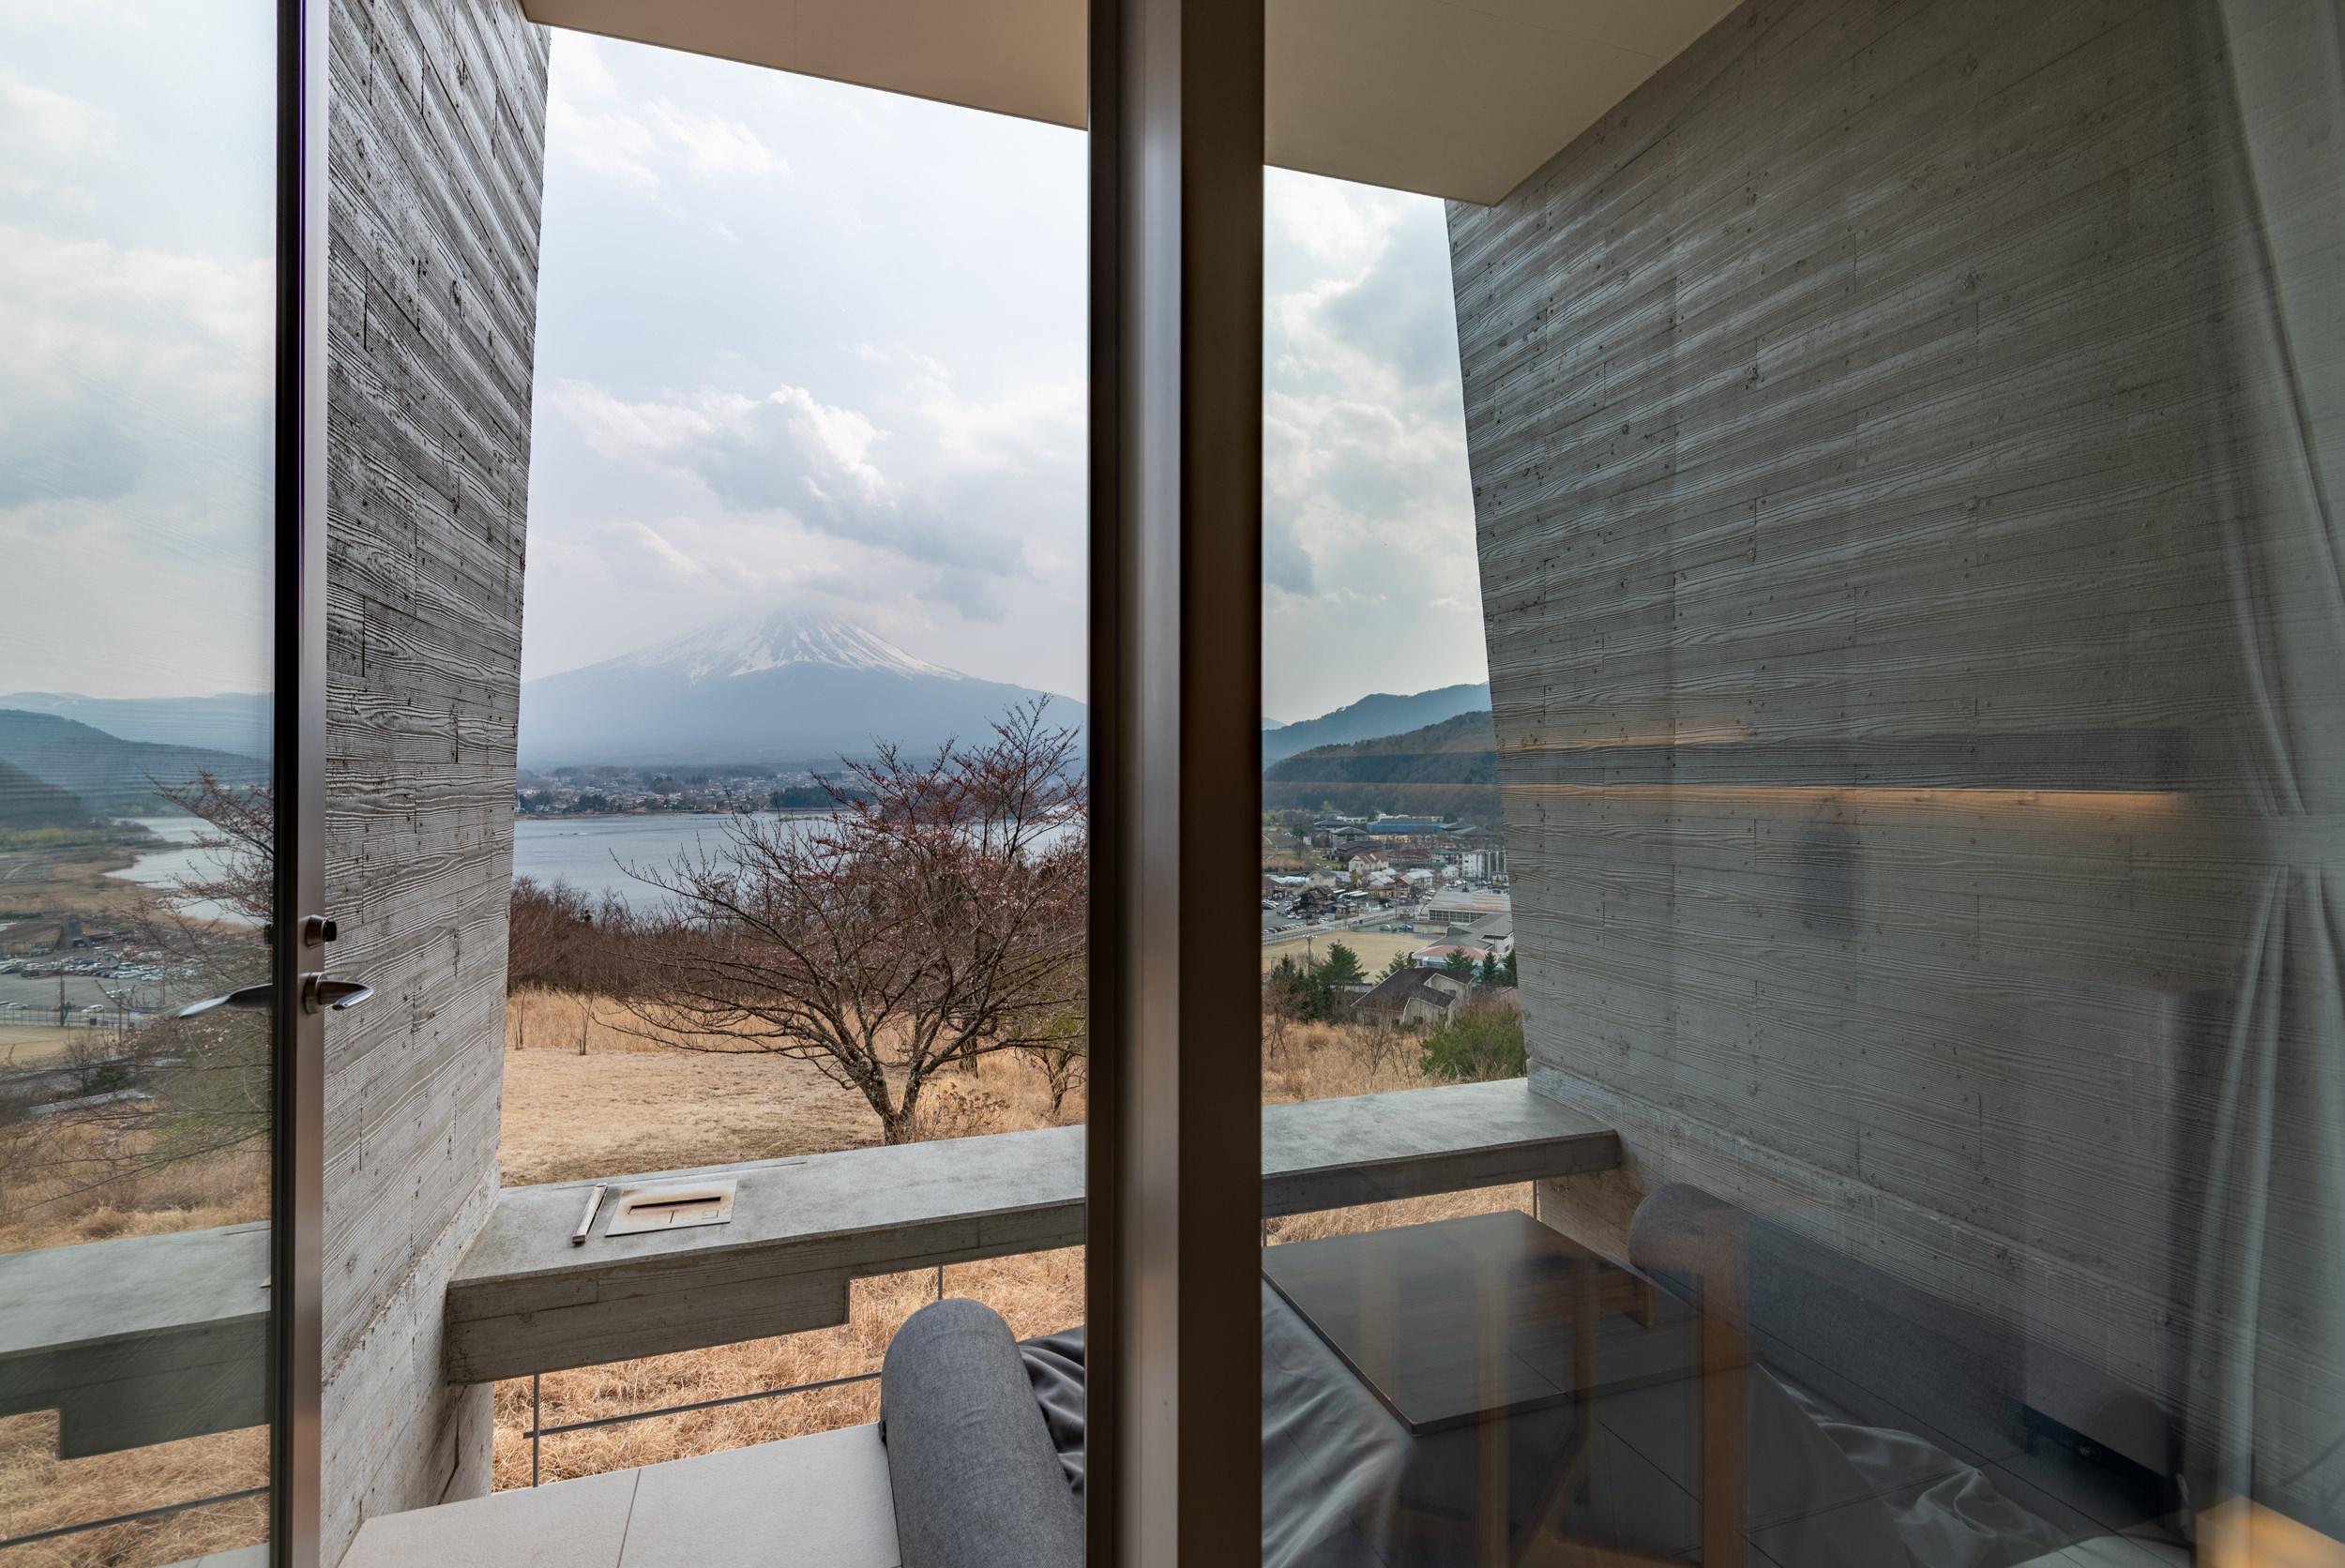 Private Terrace with View of Mt. Fuji  T Cabin - HOSHINOYA Fuji